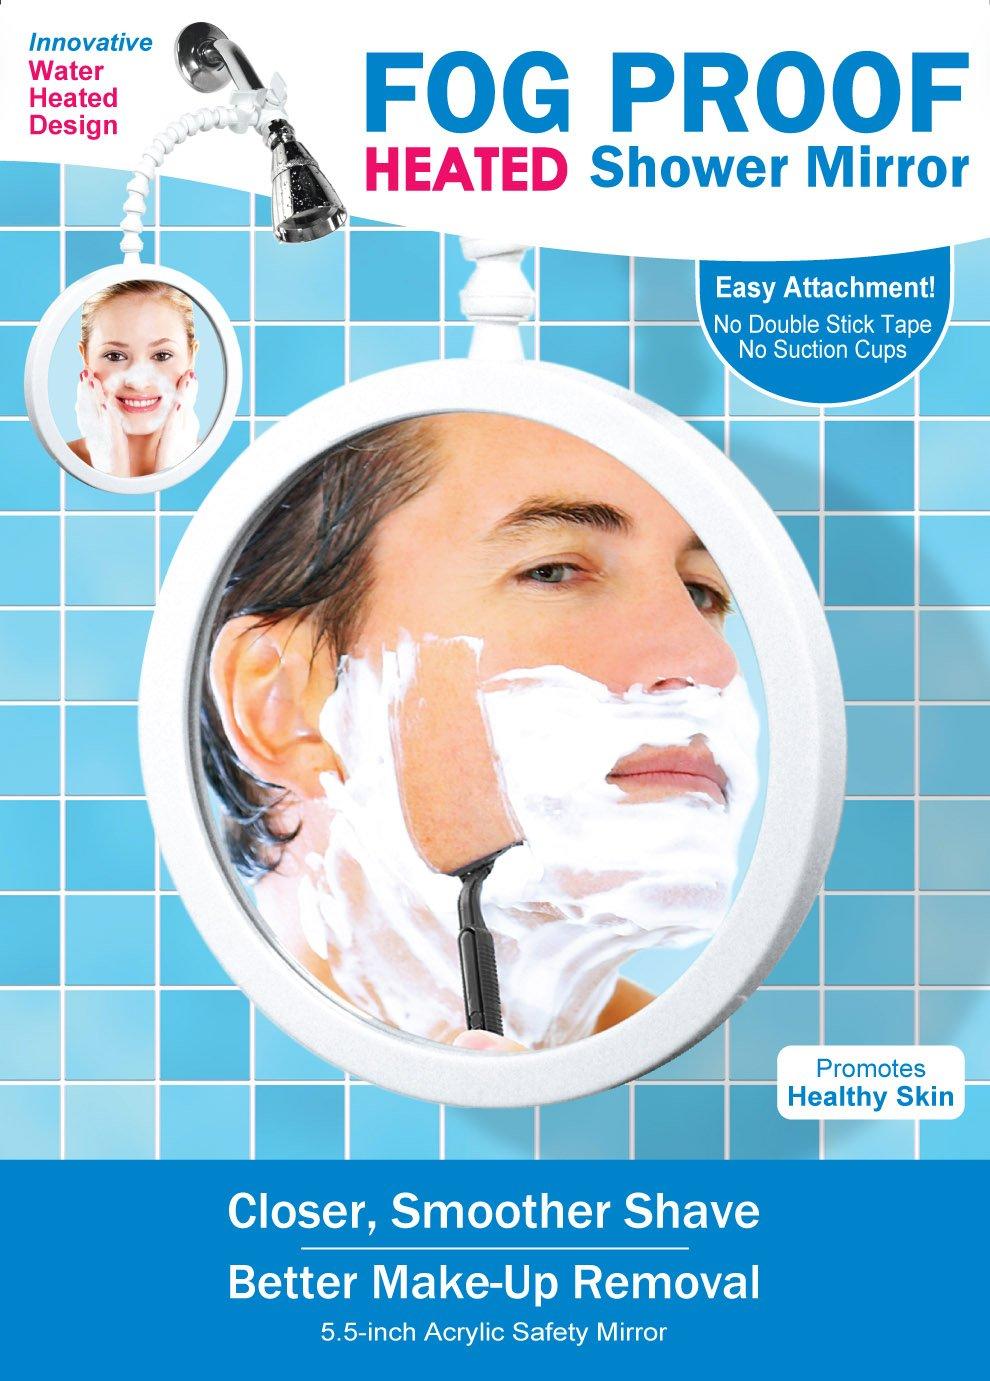 Amazon.com: ShowerTek WV2 Fog Proof Shower Mirror For Best Shaving And  Make Up Removal: Home Improvement